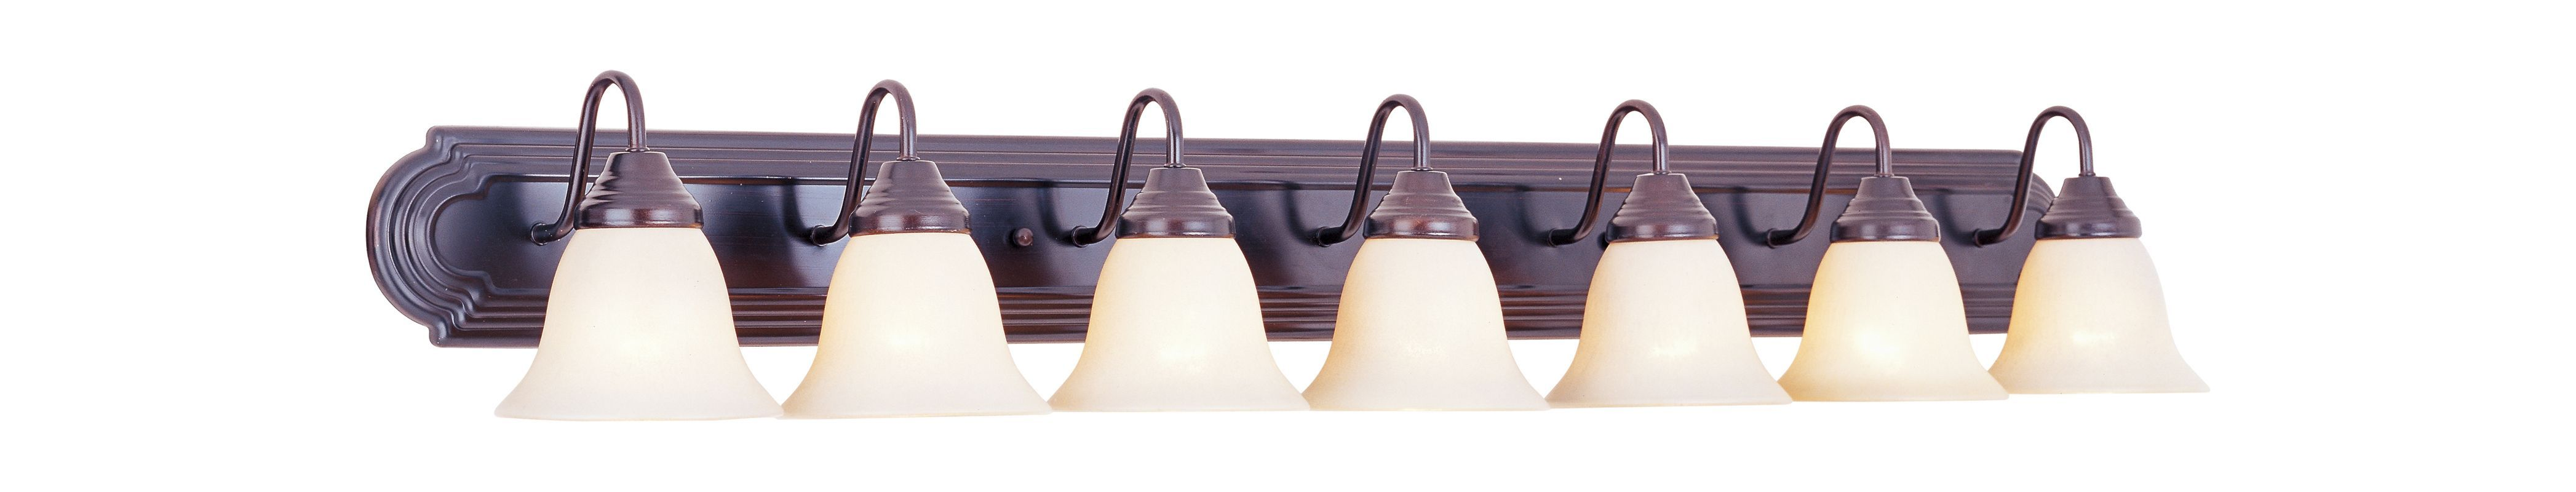 Admirable Maxim 8016 Products Vanity Lighting Bath Light Maxim Download Free Architecture Designs Jebrpmadebymaigaardcom